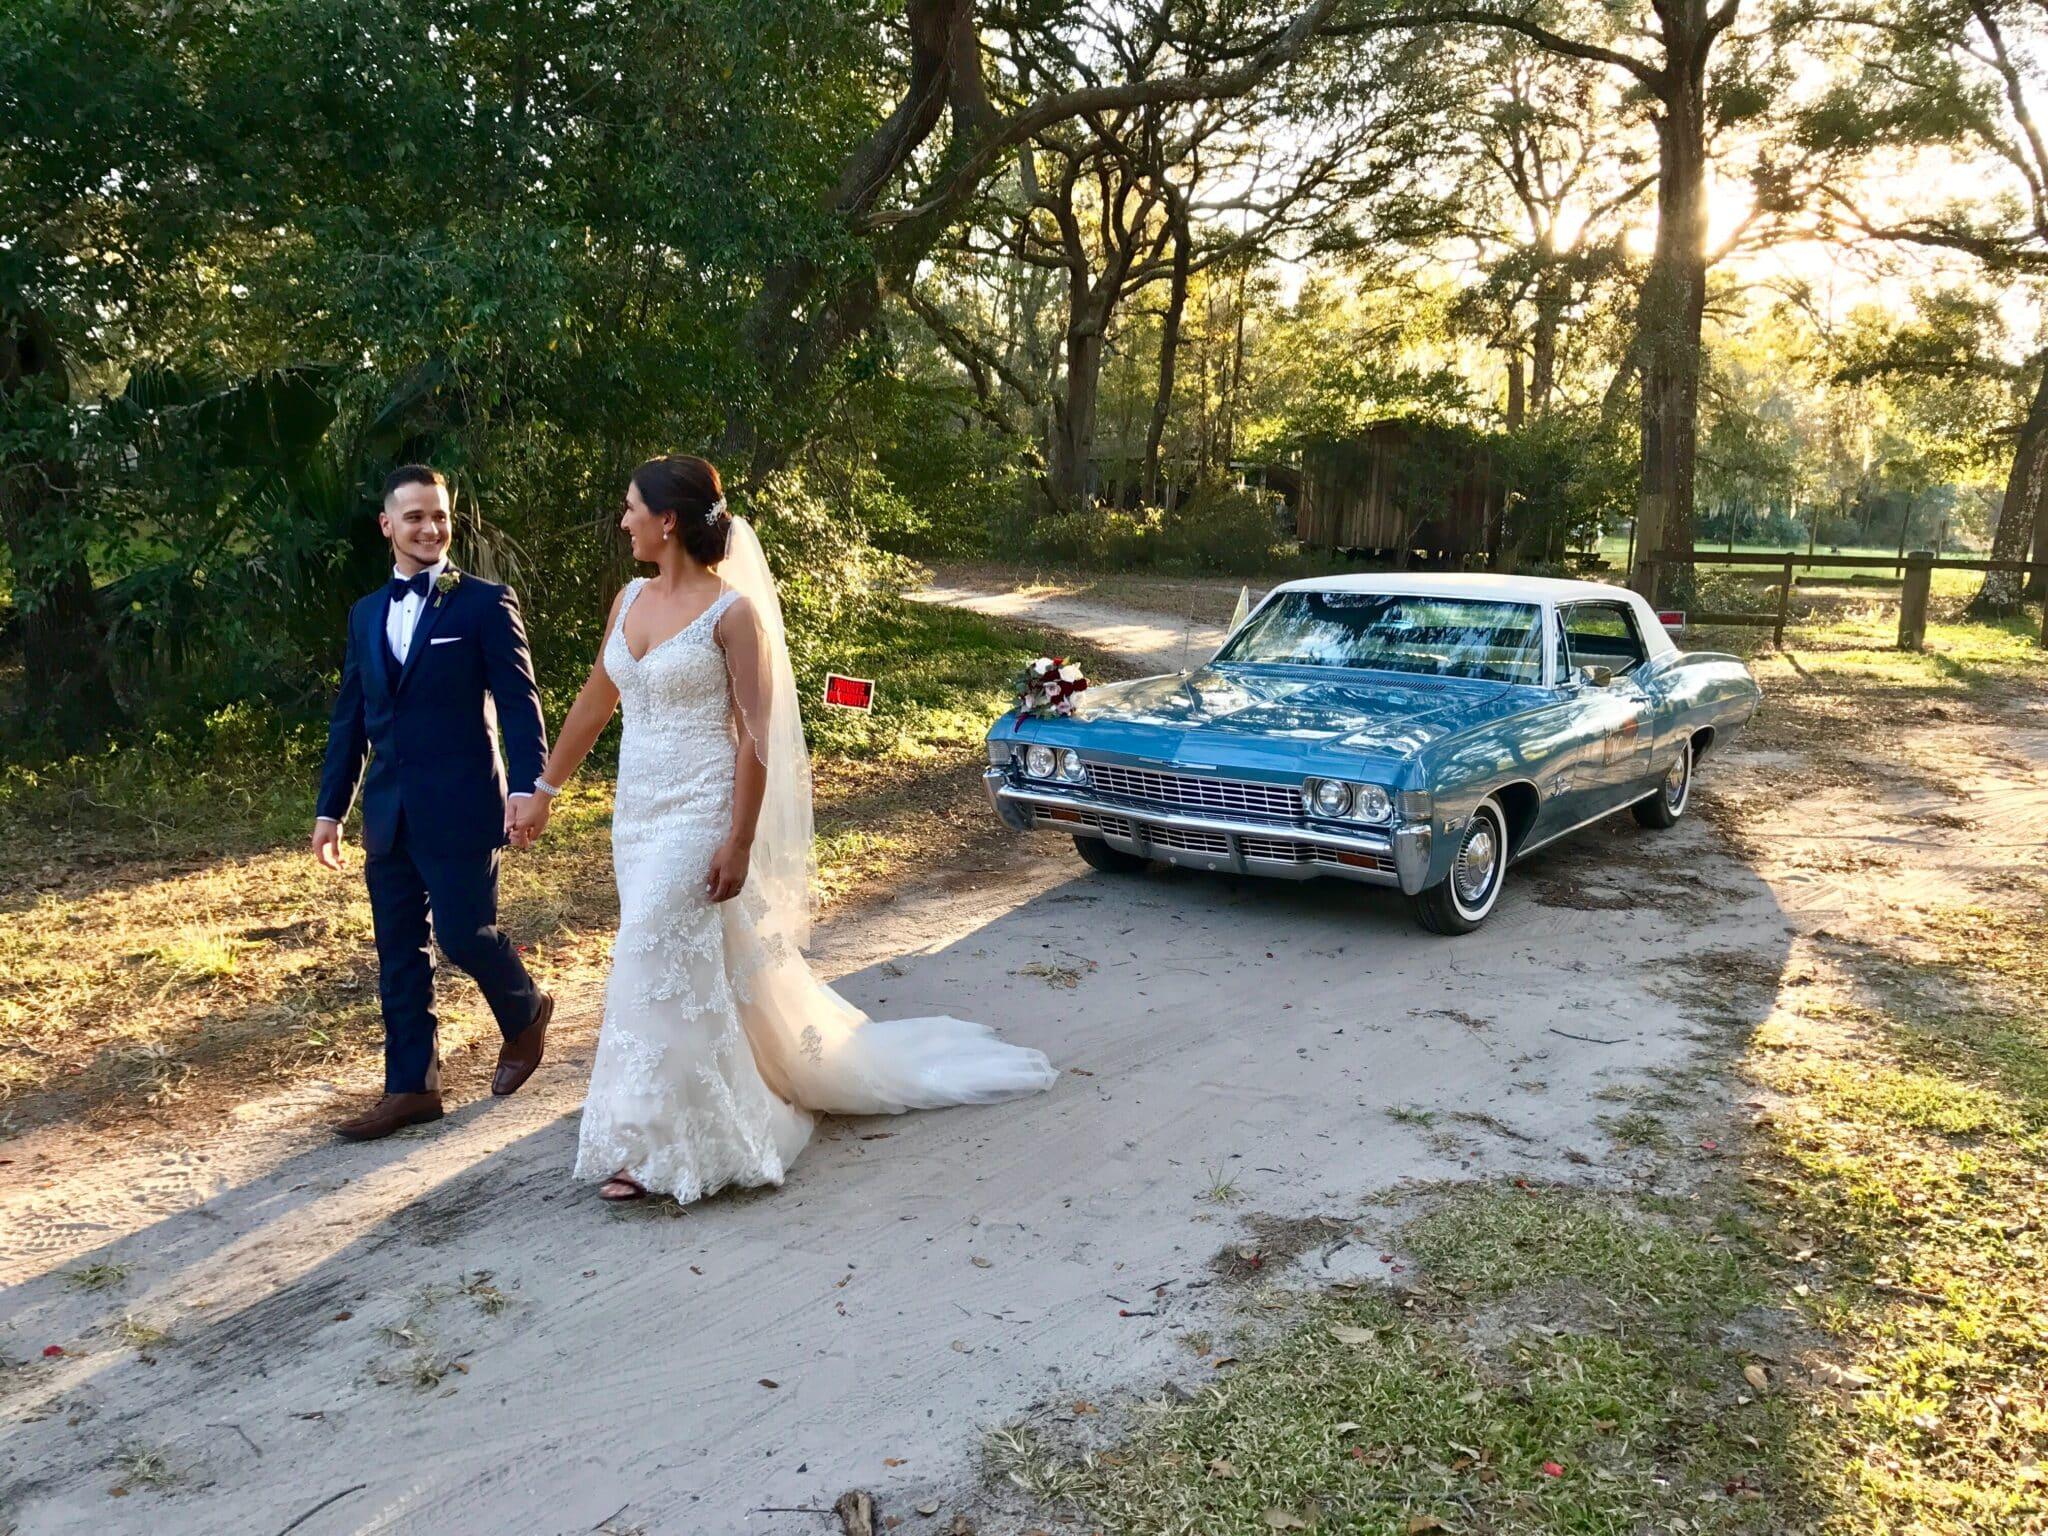 68 Chevy Impala Car Service